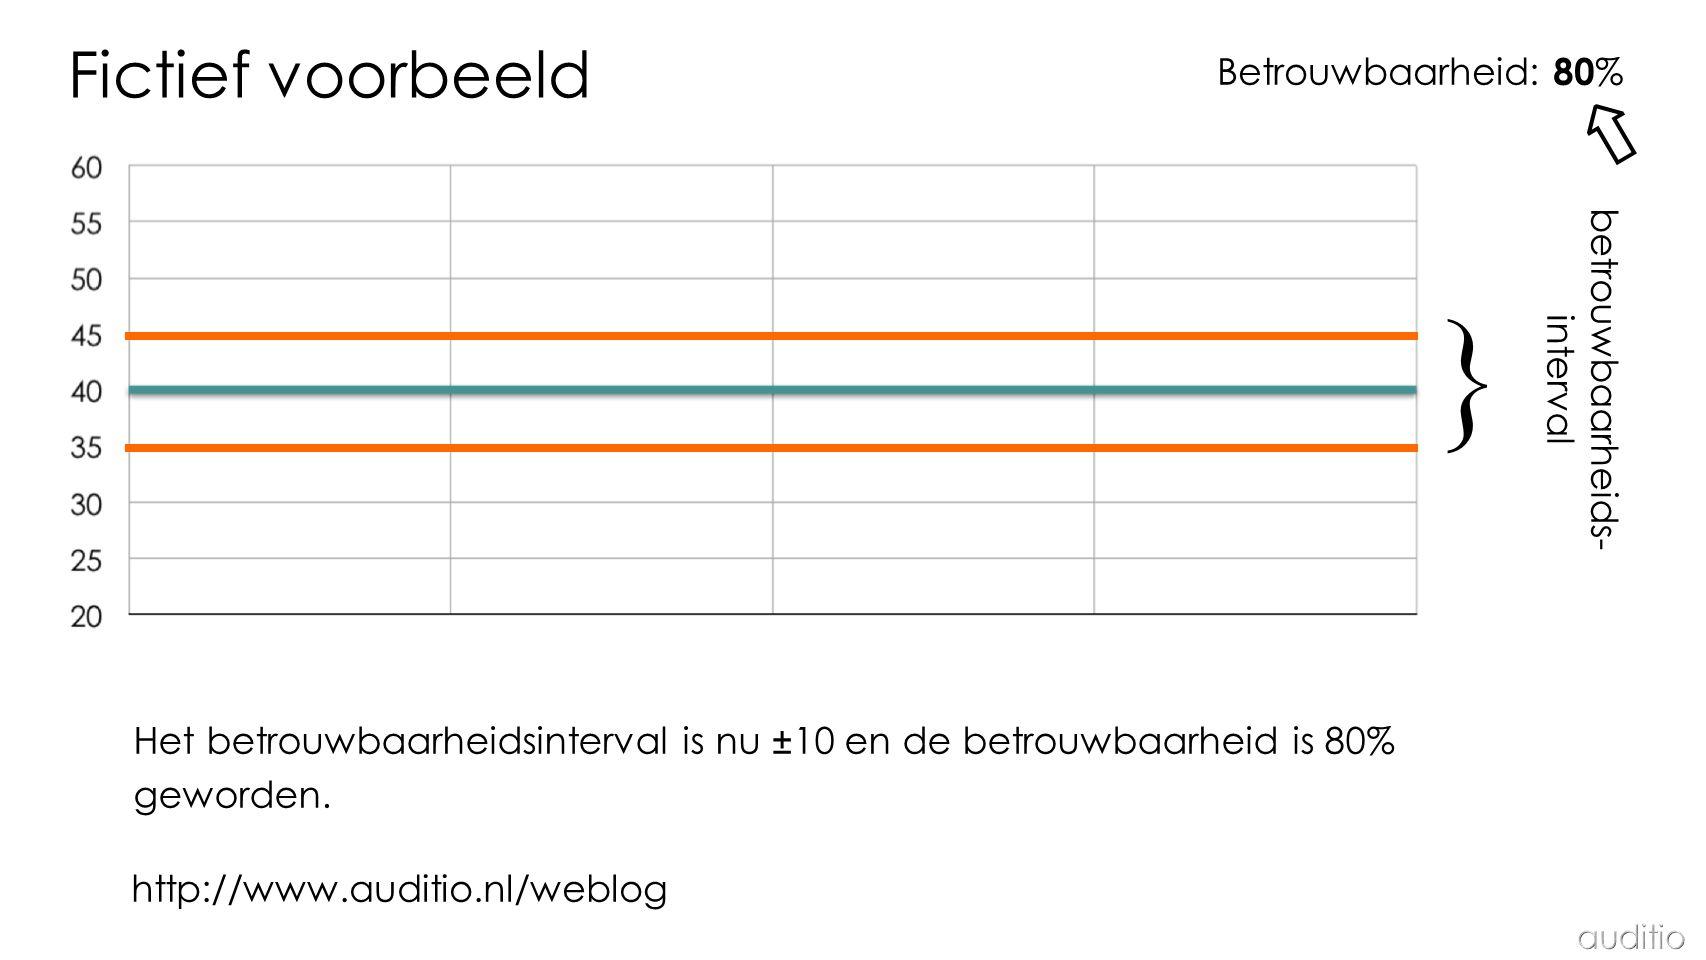 } ⇧ Fictief voorbeeld Betrouwbaarheid: 80% betrouwbaarheids- interval